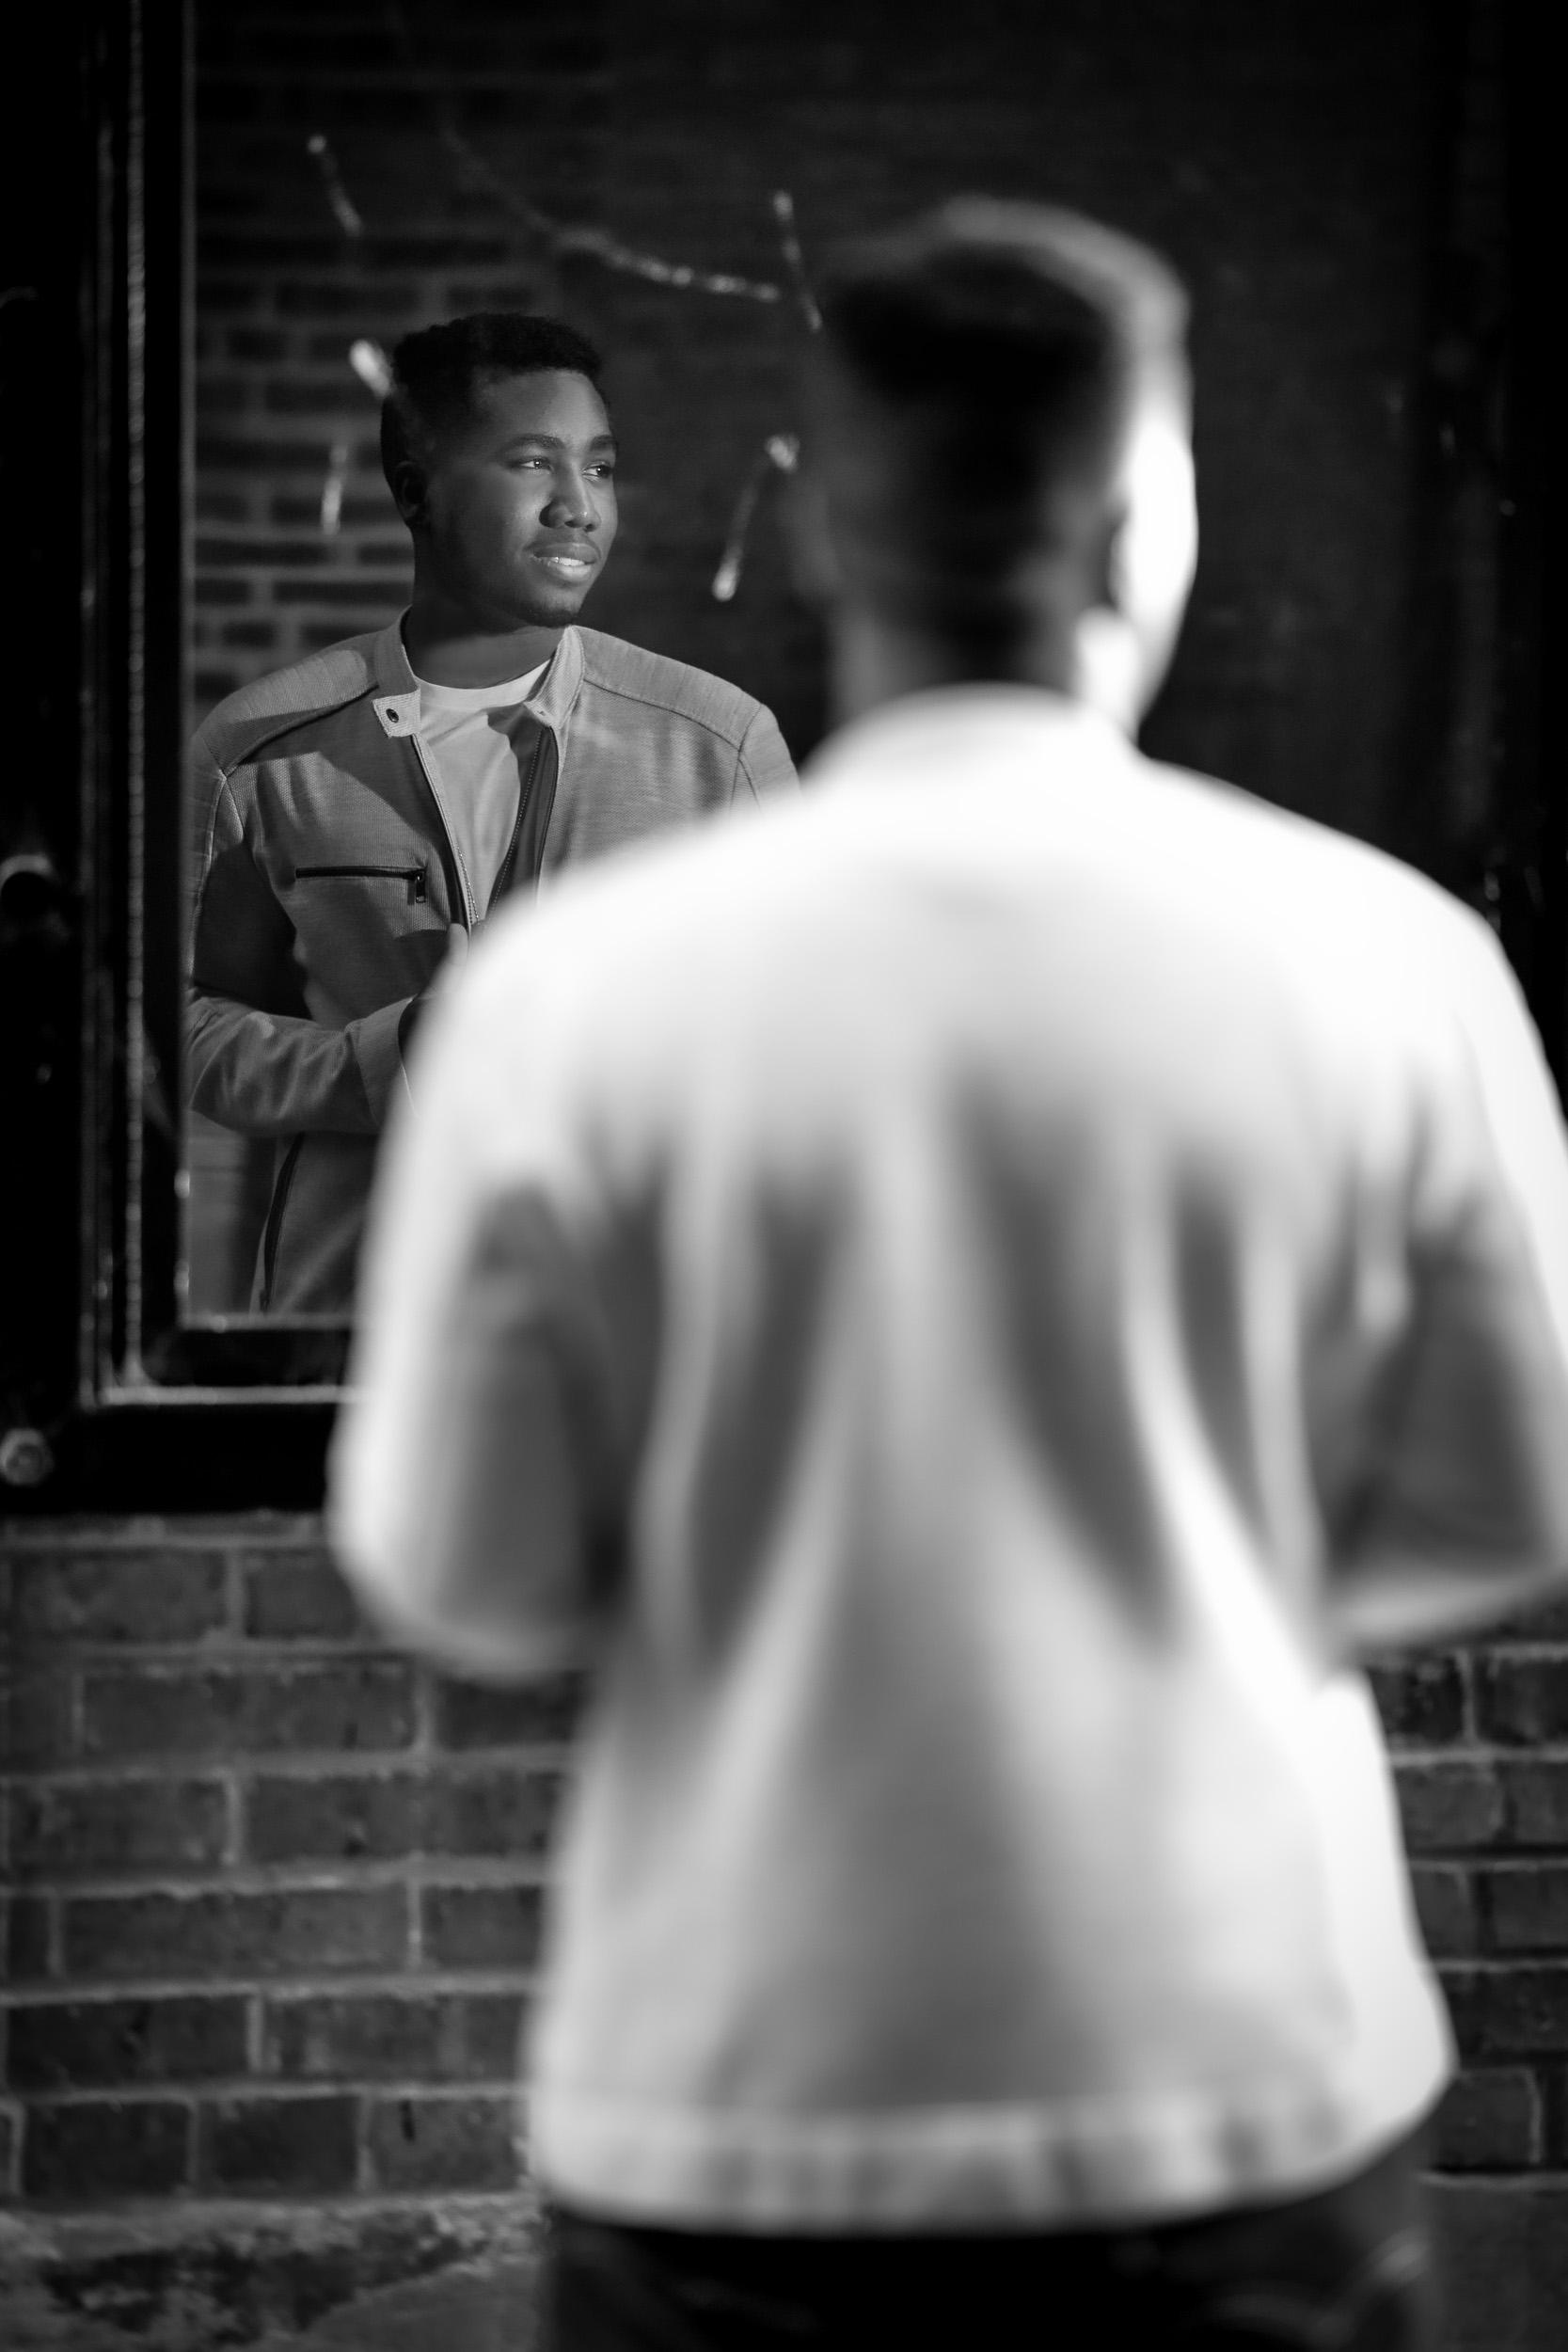 gq-senior-mirror-image